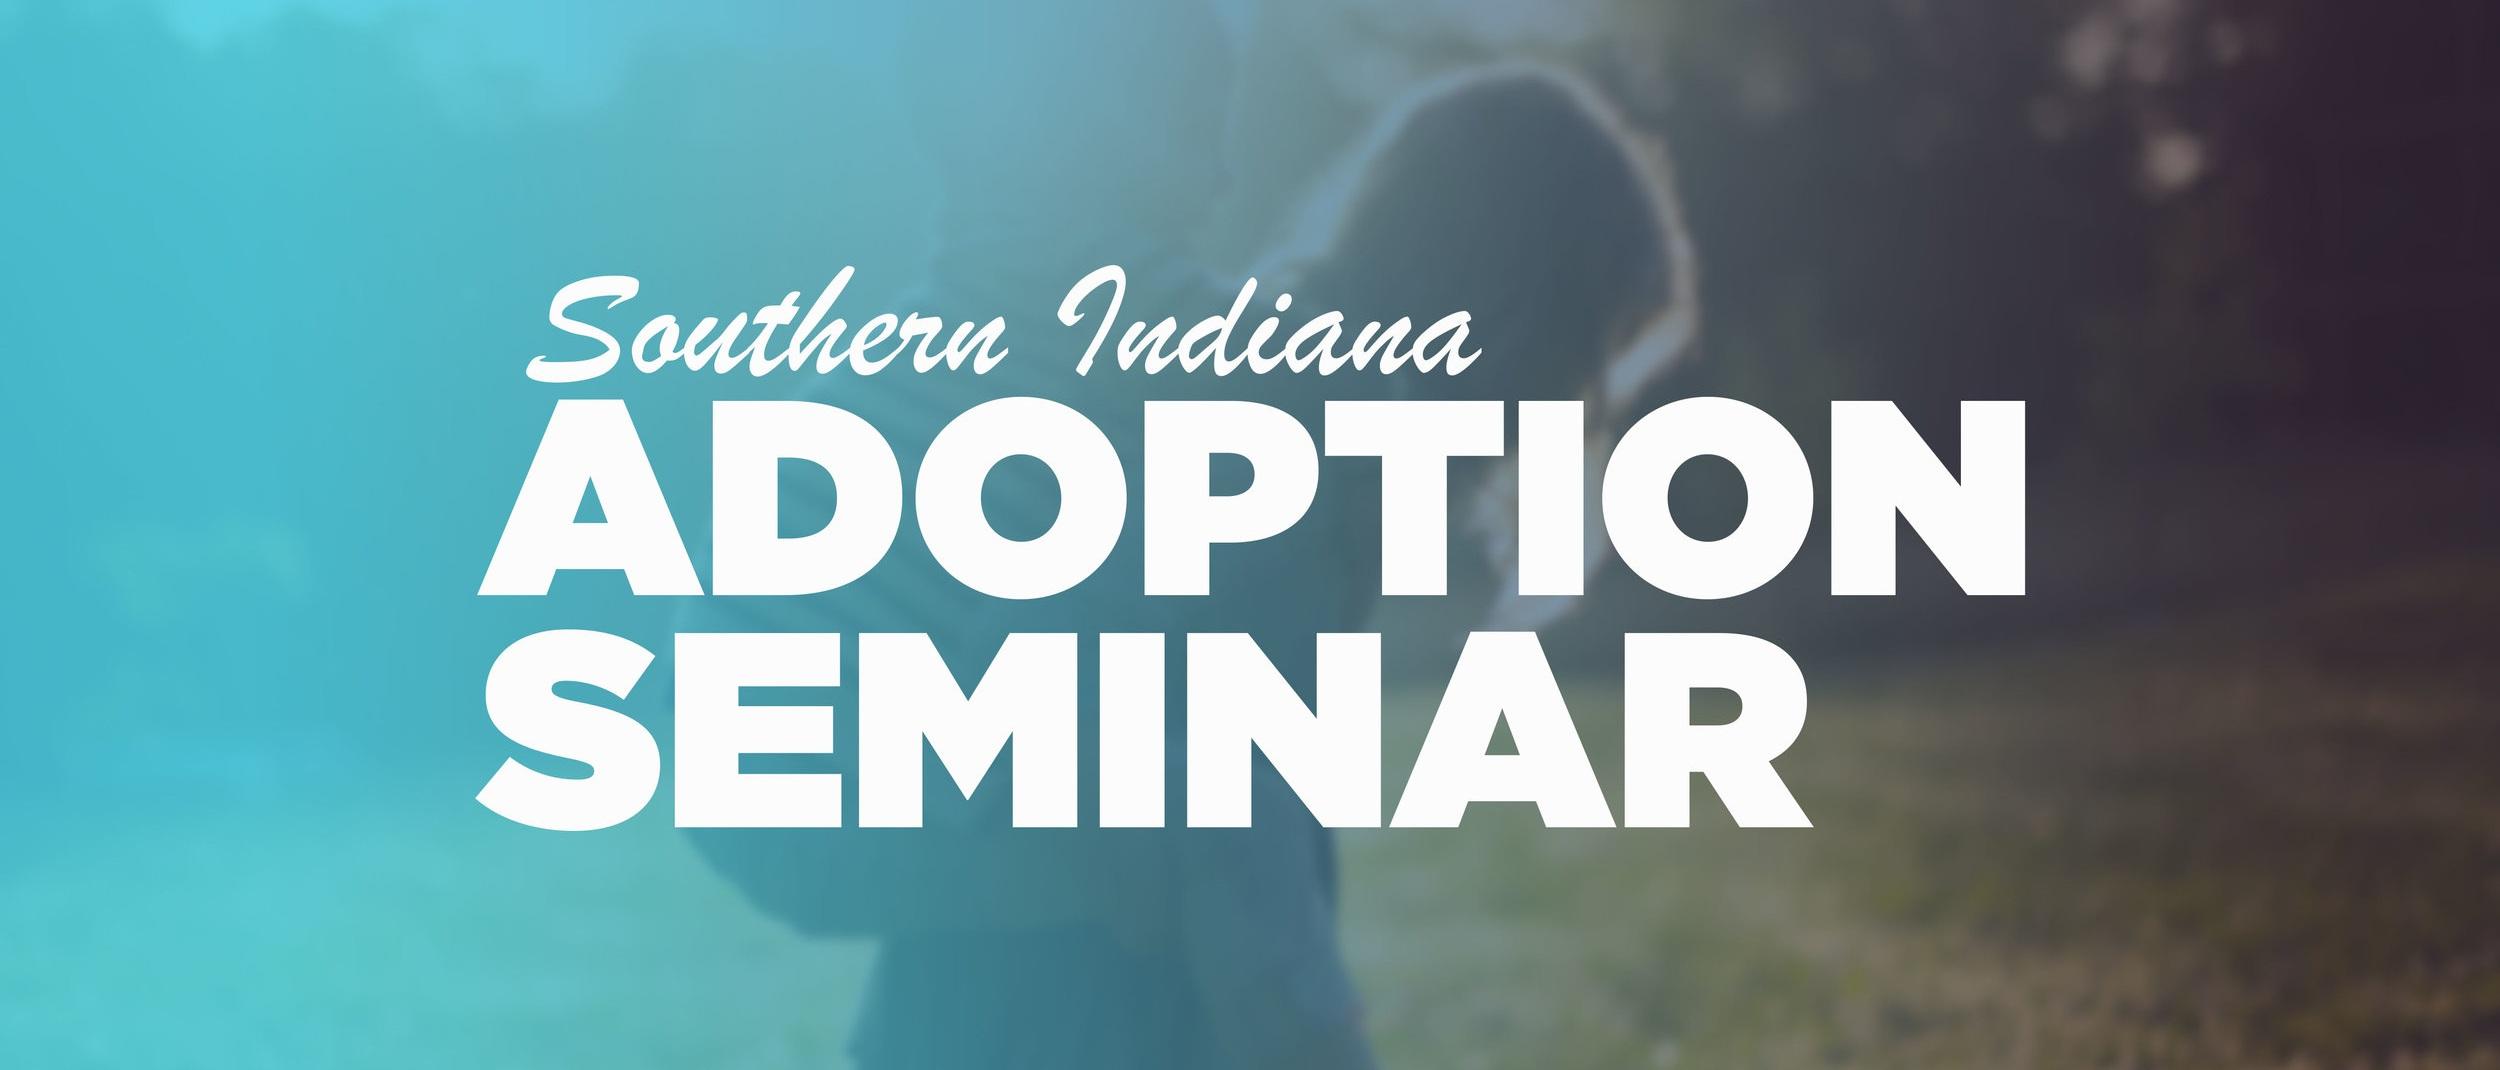 Adoption+Seminar+Title.jpg